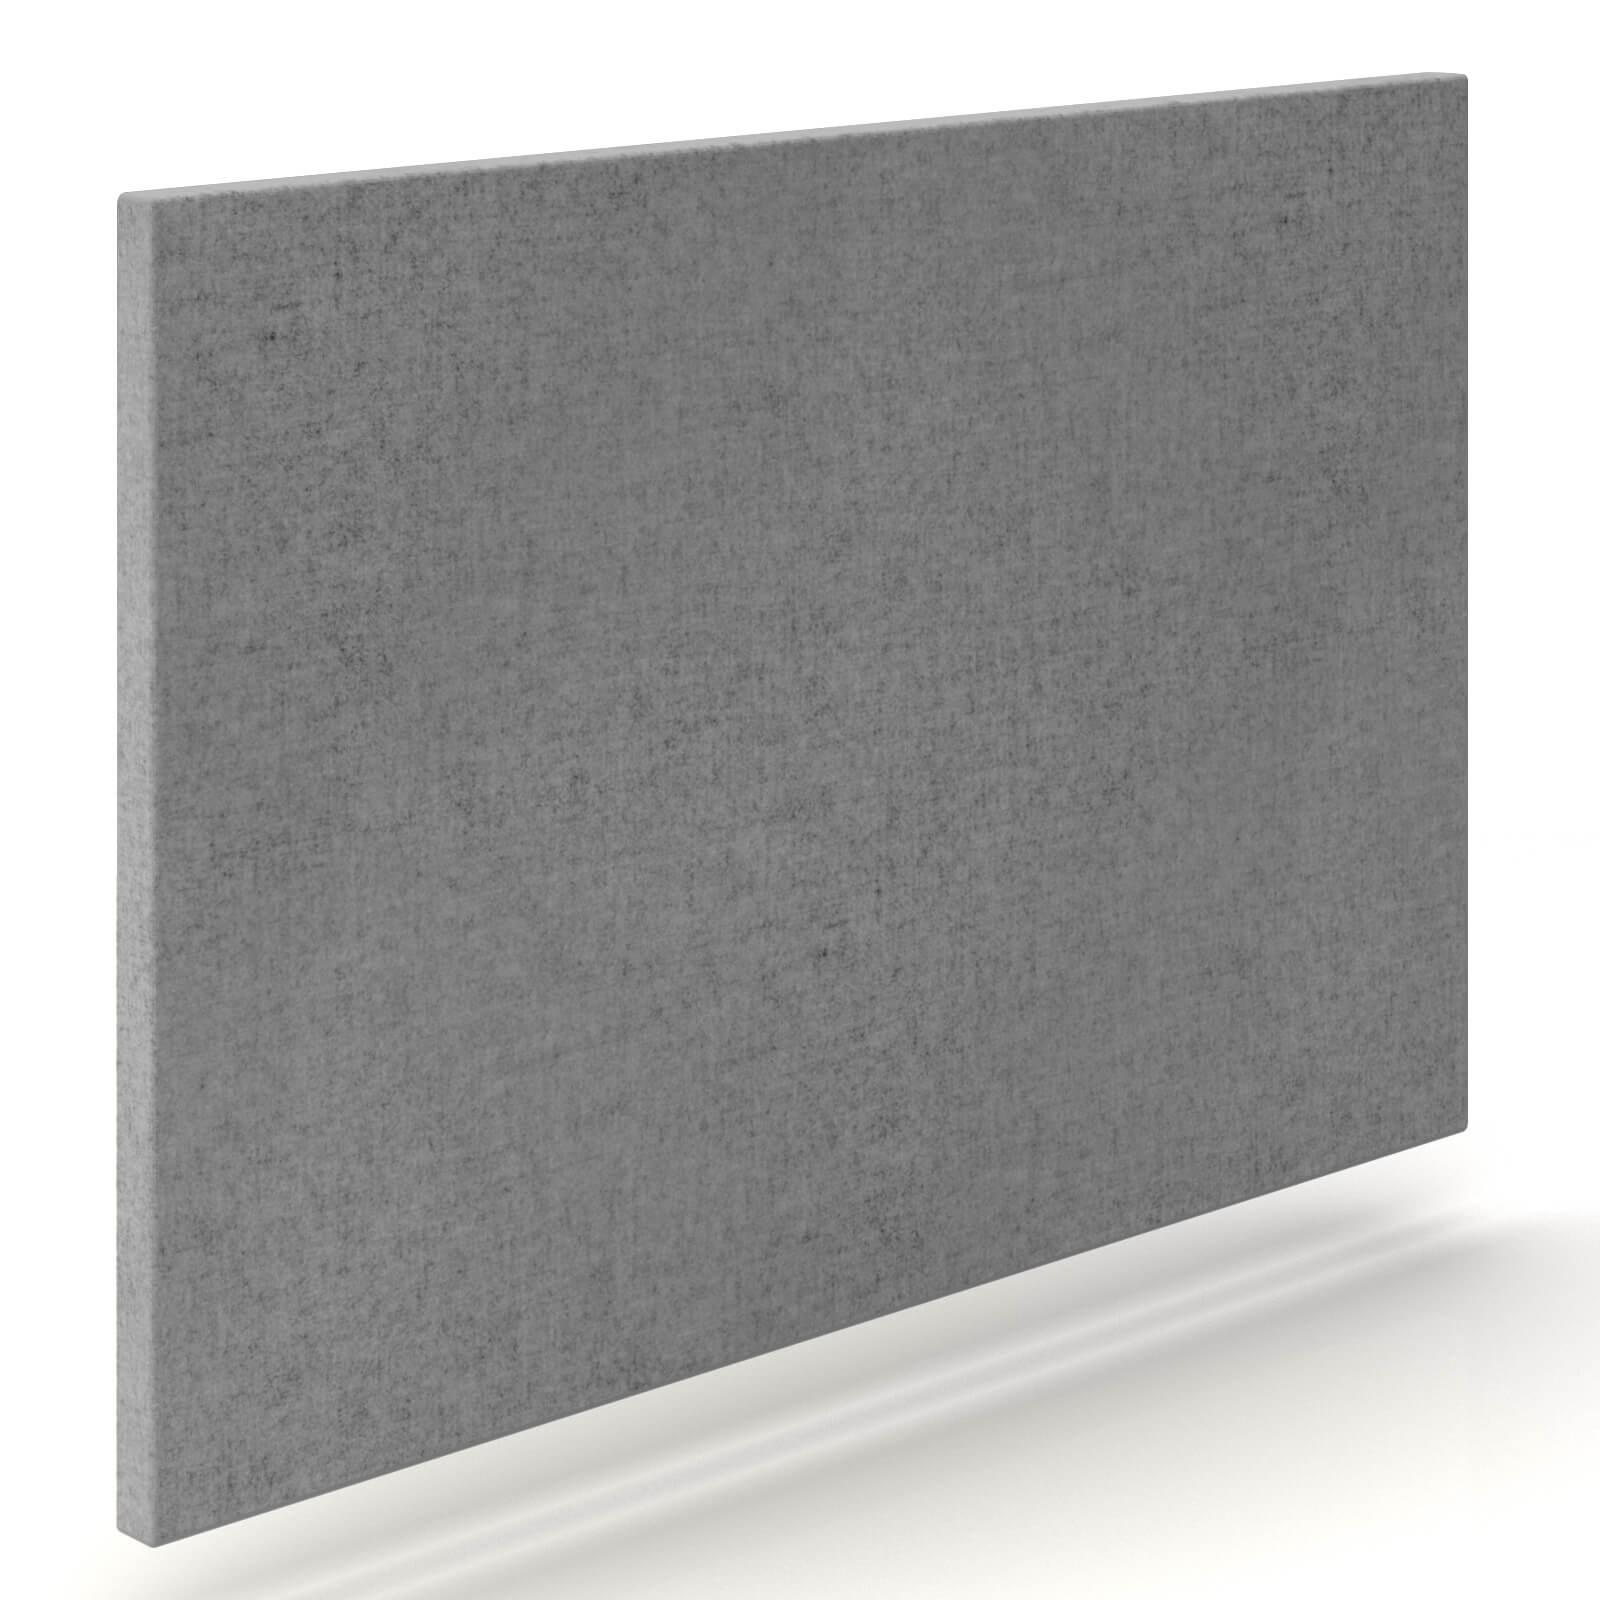 Akustik Deckensegel MODUS 1.200 x 800 mm horizontal Akustikplatten Paneel Filz